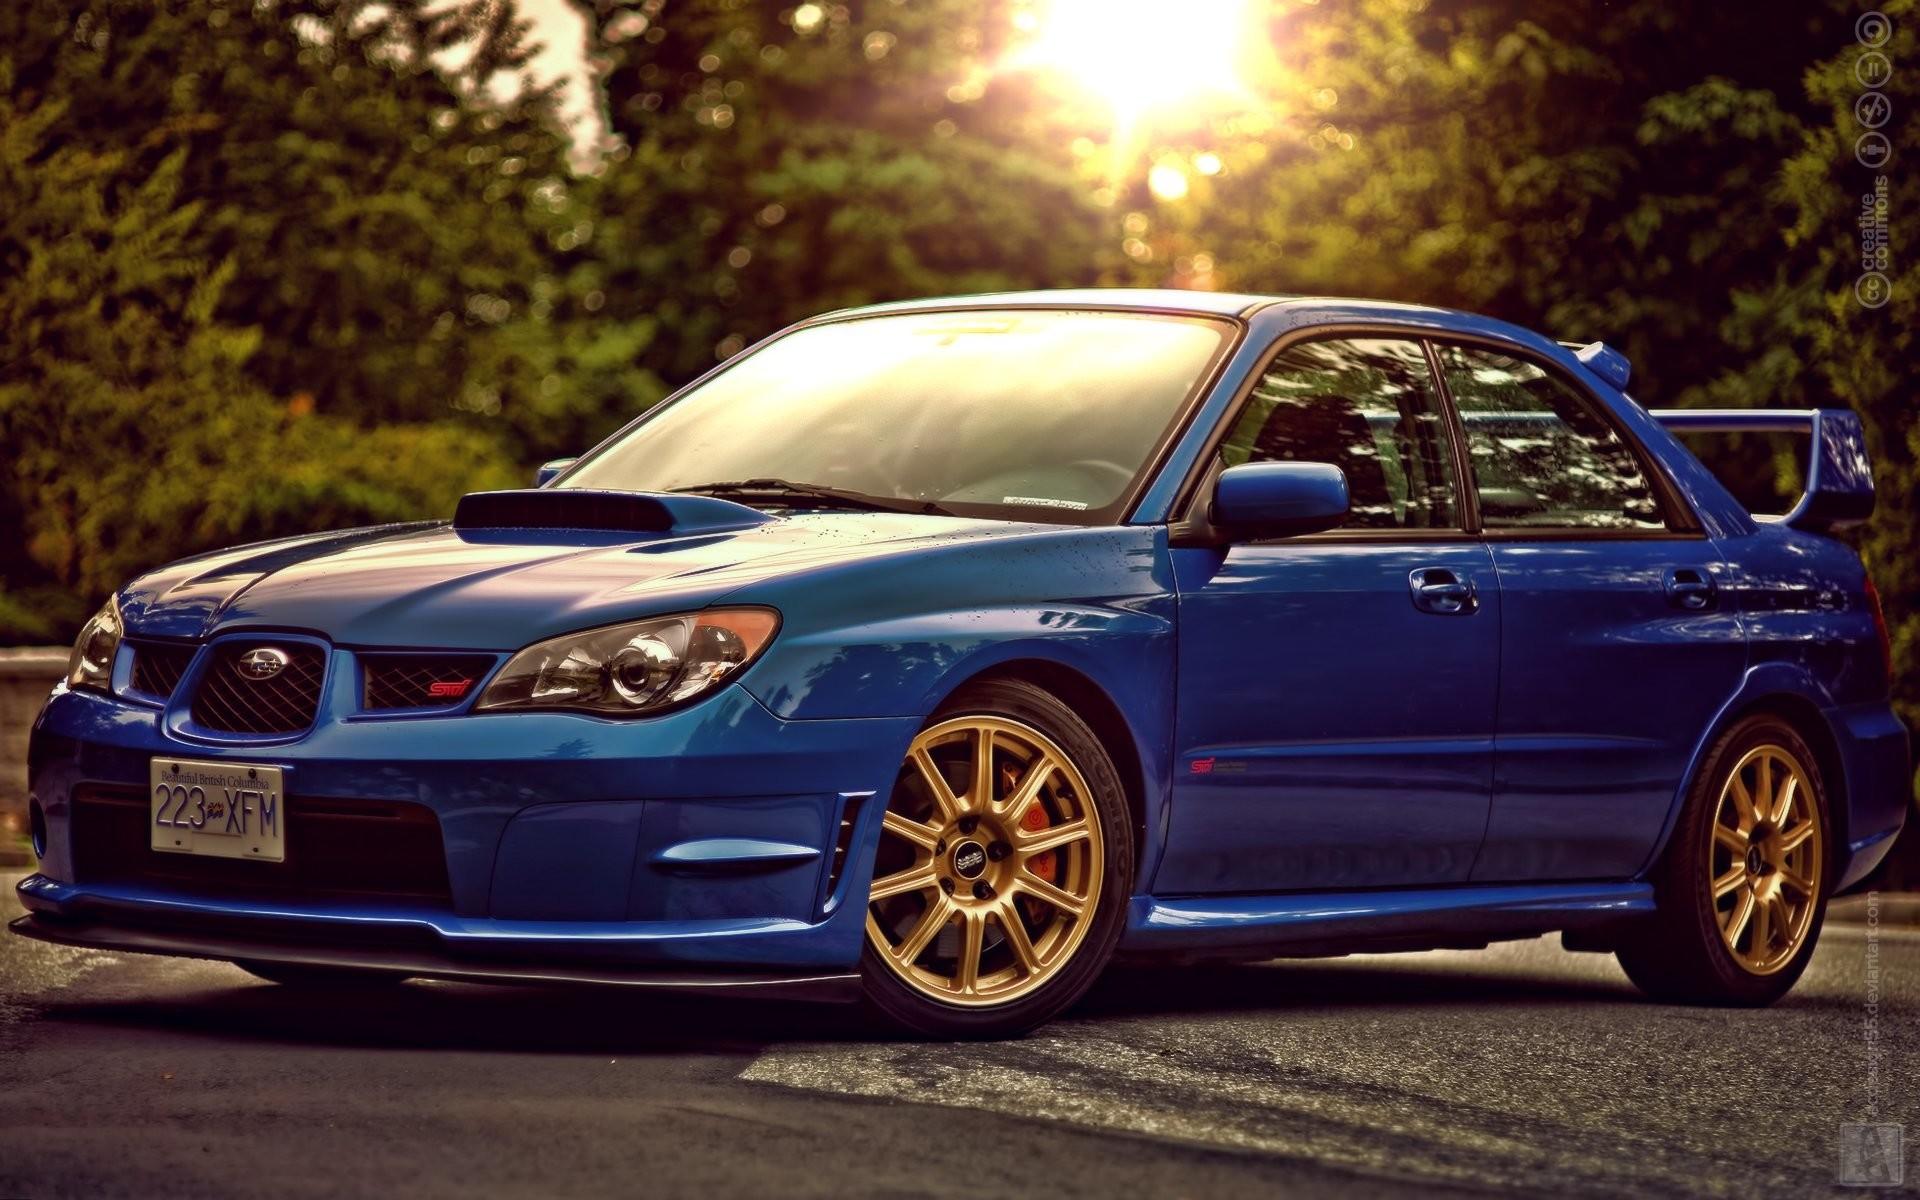 Subaru Wrx Sti Wallpaper 63 Images